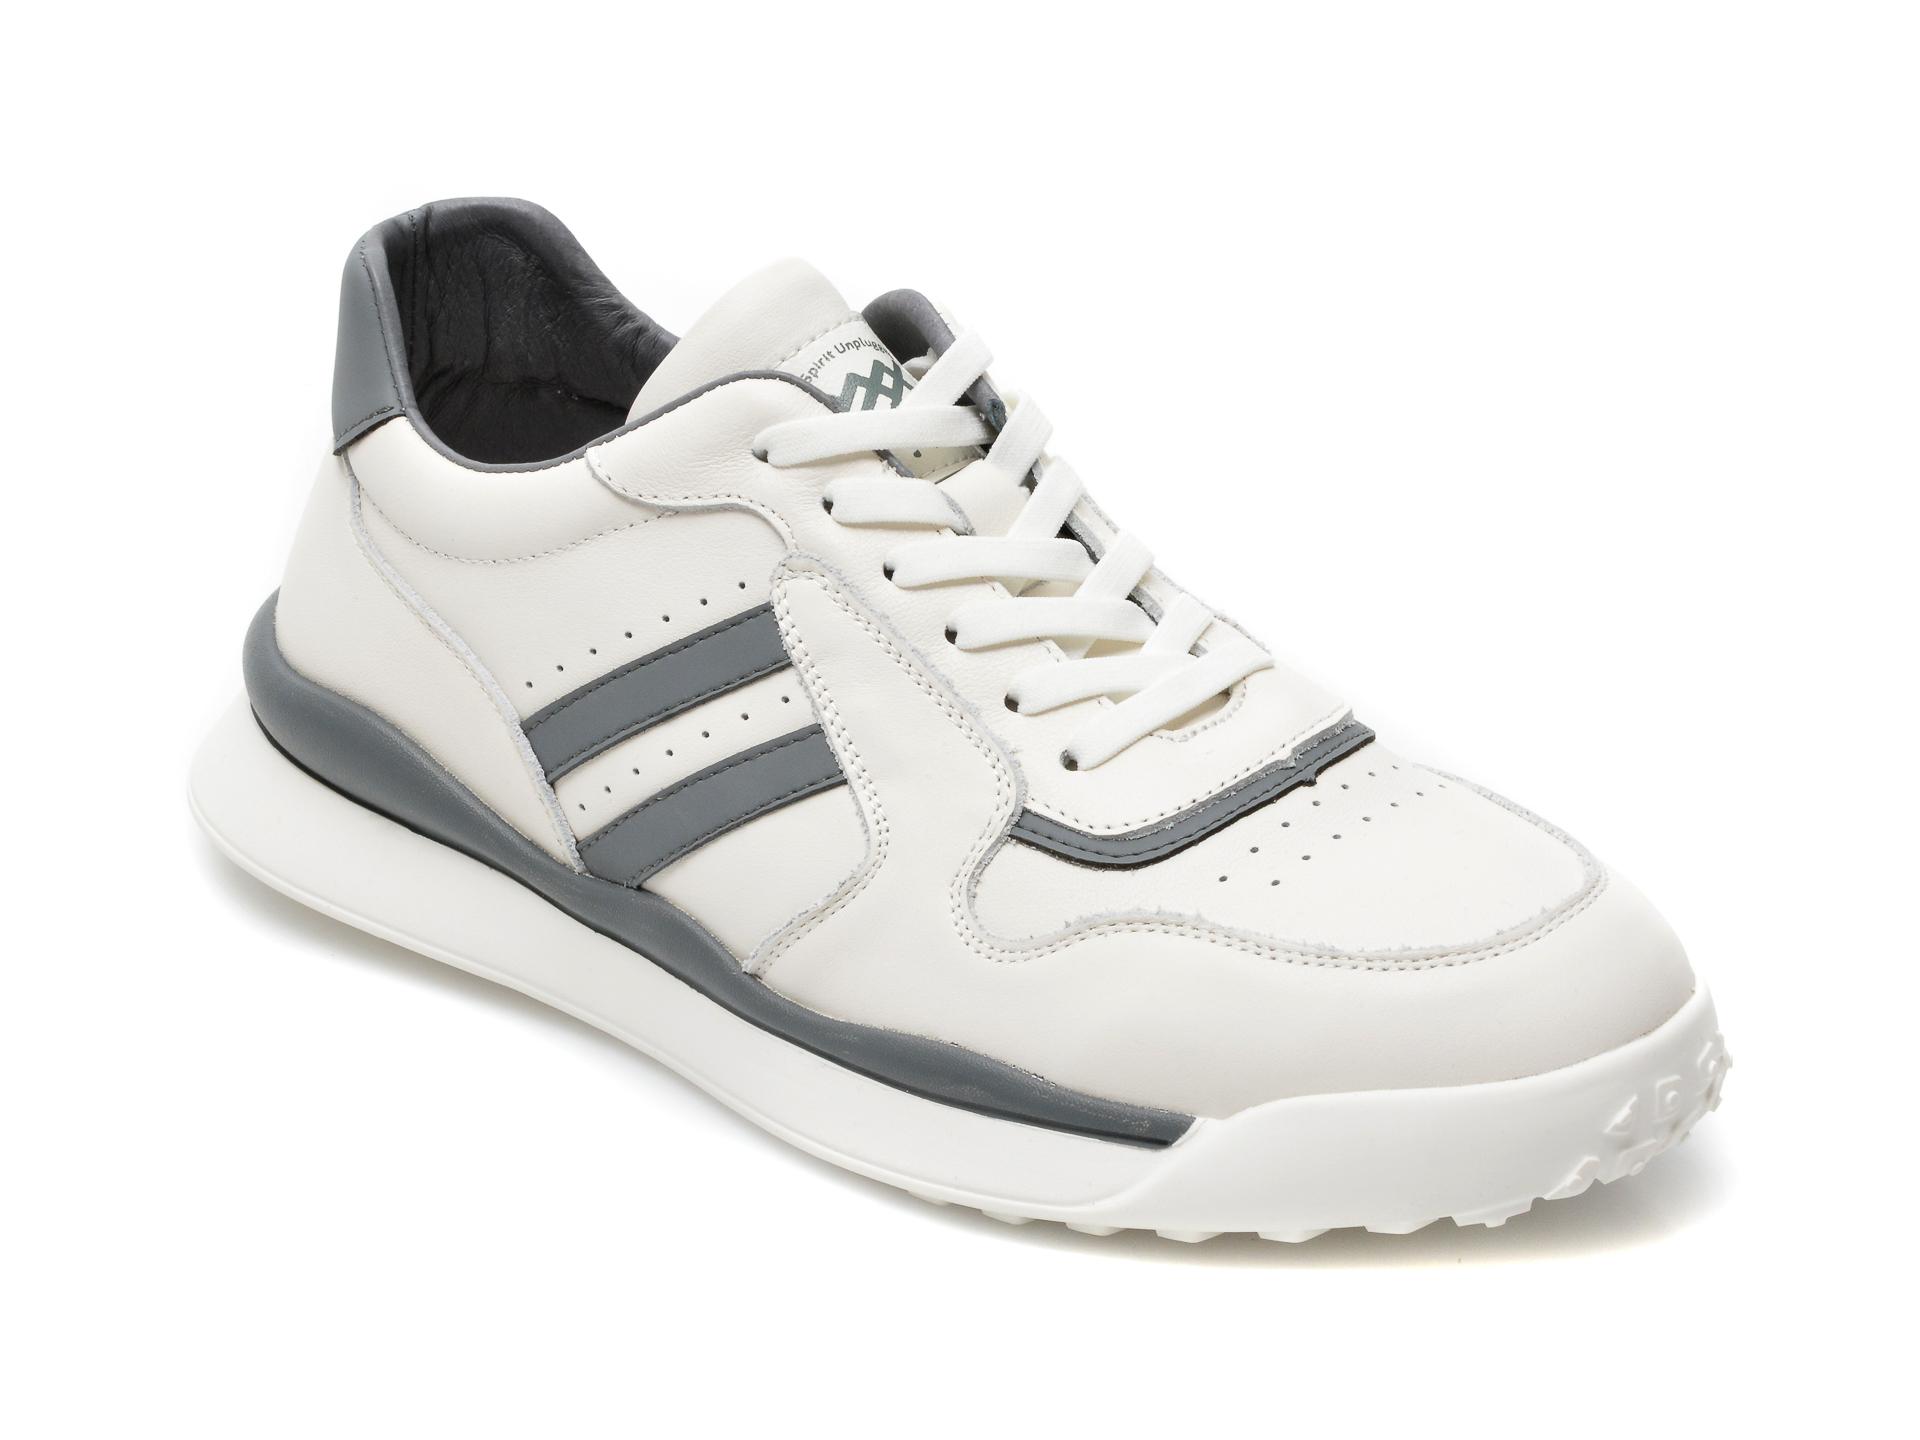 Pantofi Sport Gryxx Albi, 21215, Din Piele Naturala